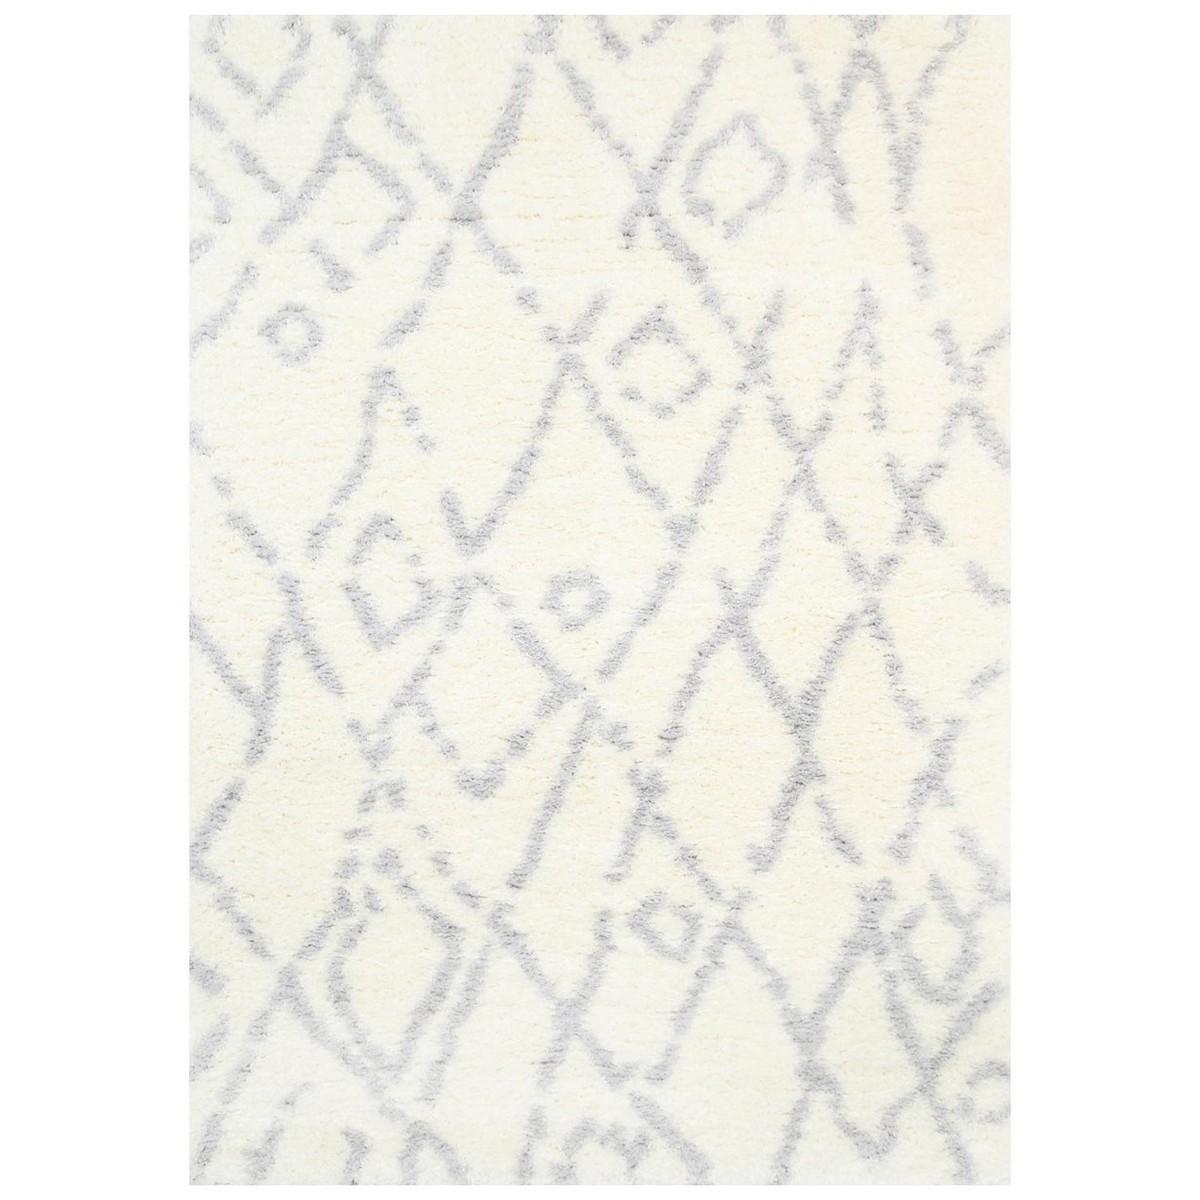 Moroccan Fes Super Soft Shaggy Rug, 160x230cm, Cream/Silver